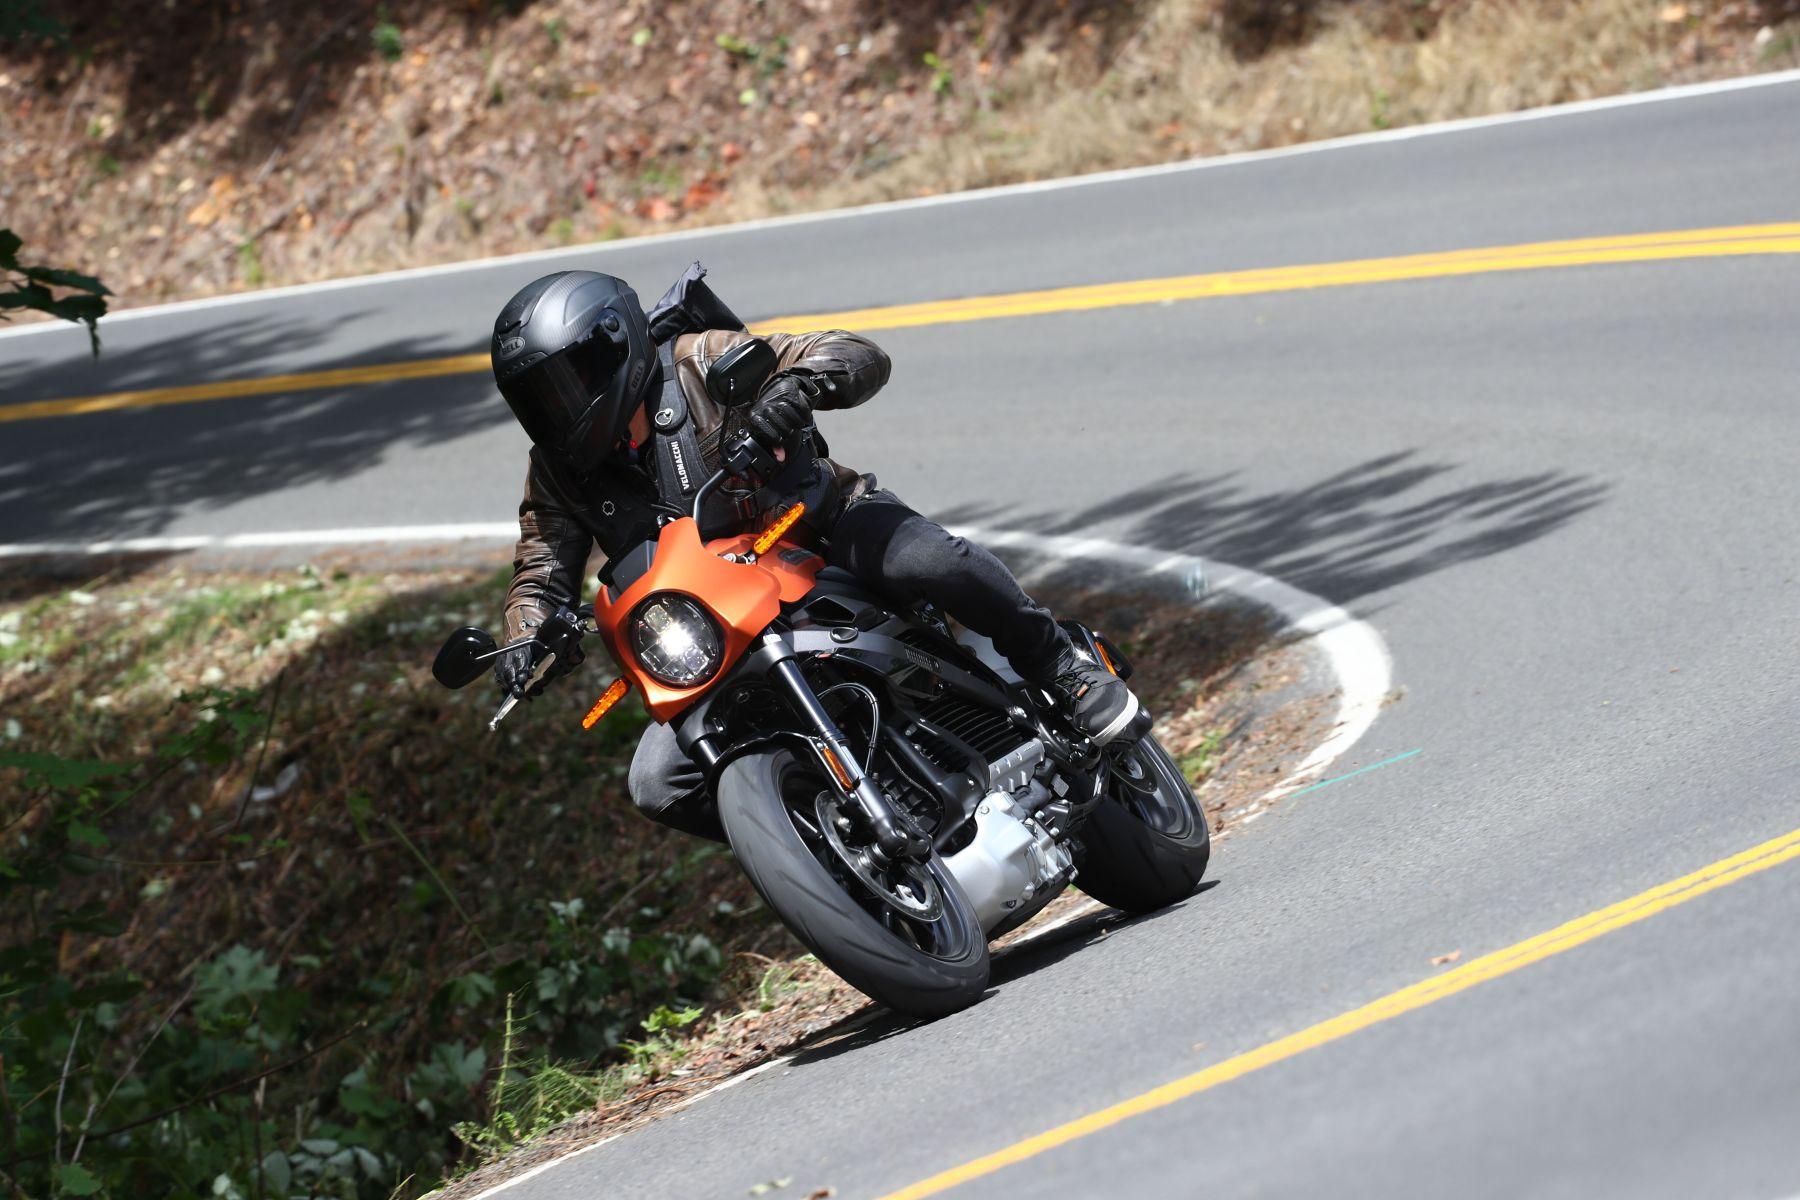 2020 Harley-Davidson LiveWire (Courtesy of Harley-Davidson)